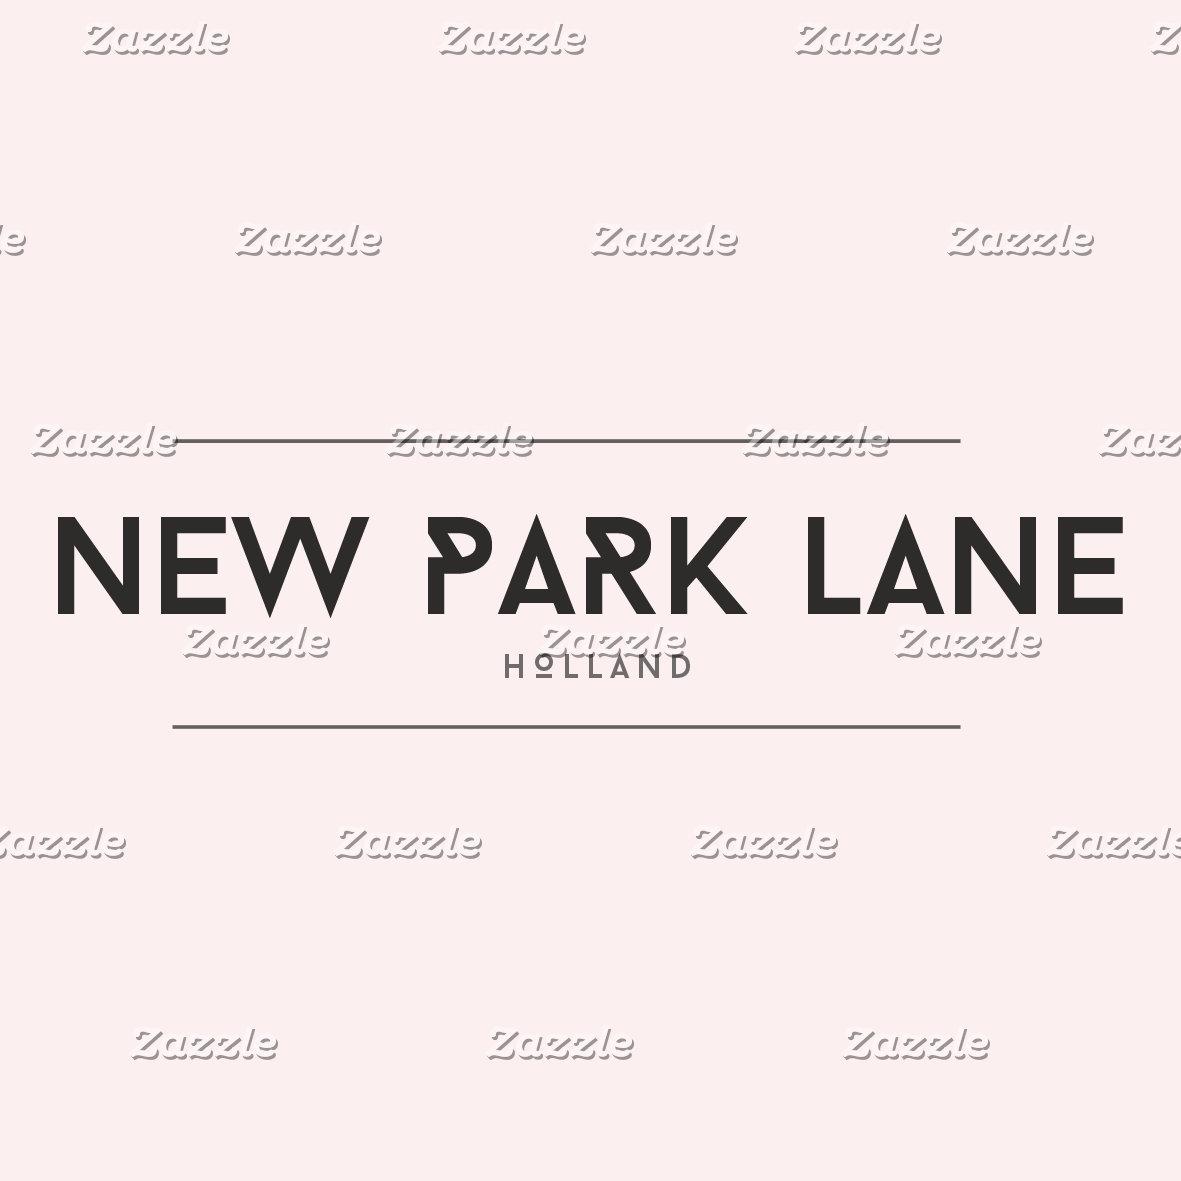 NewParkLane